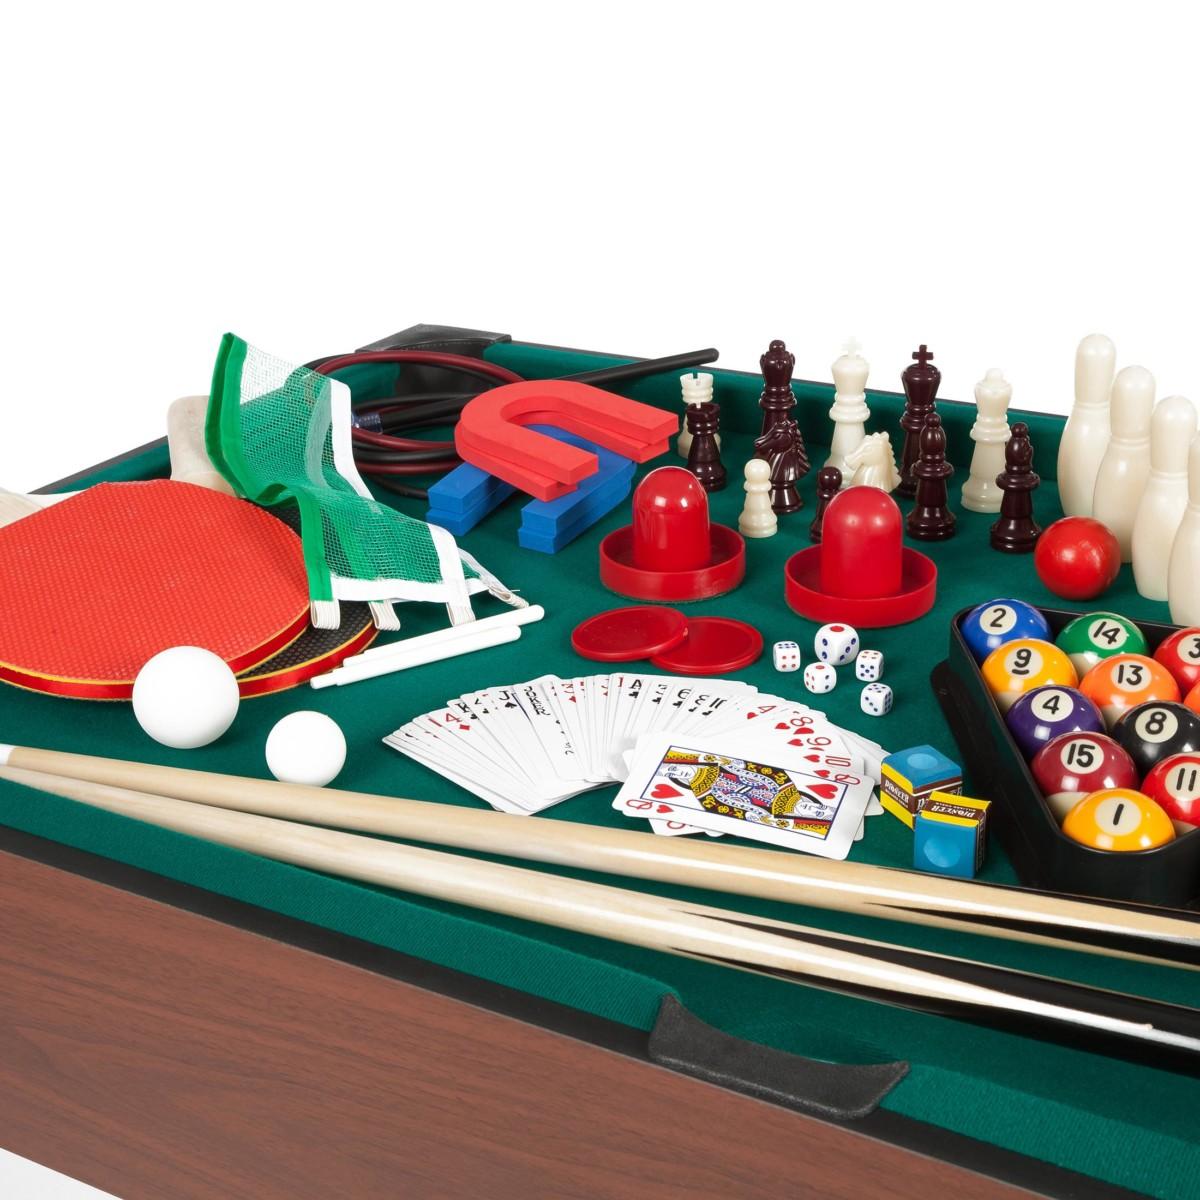 Ultrasport Table de Jeux 12 en 1, Dimensions de la Table : env. 107 x